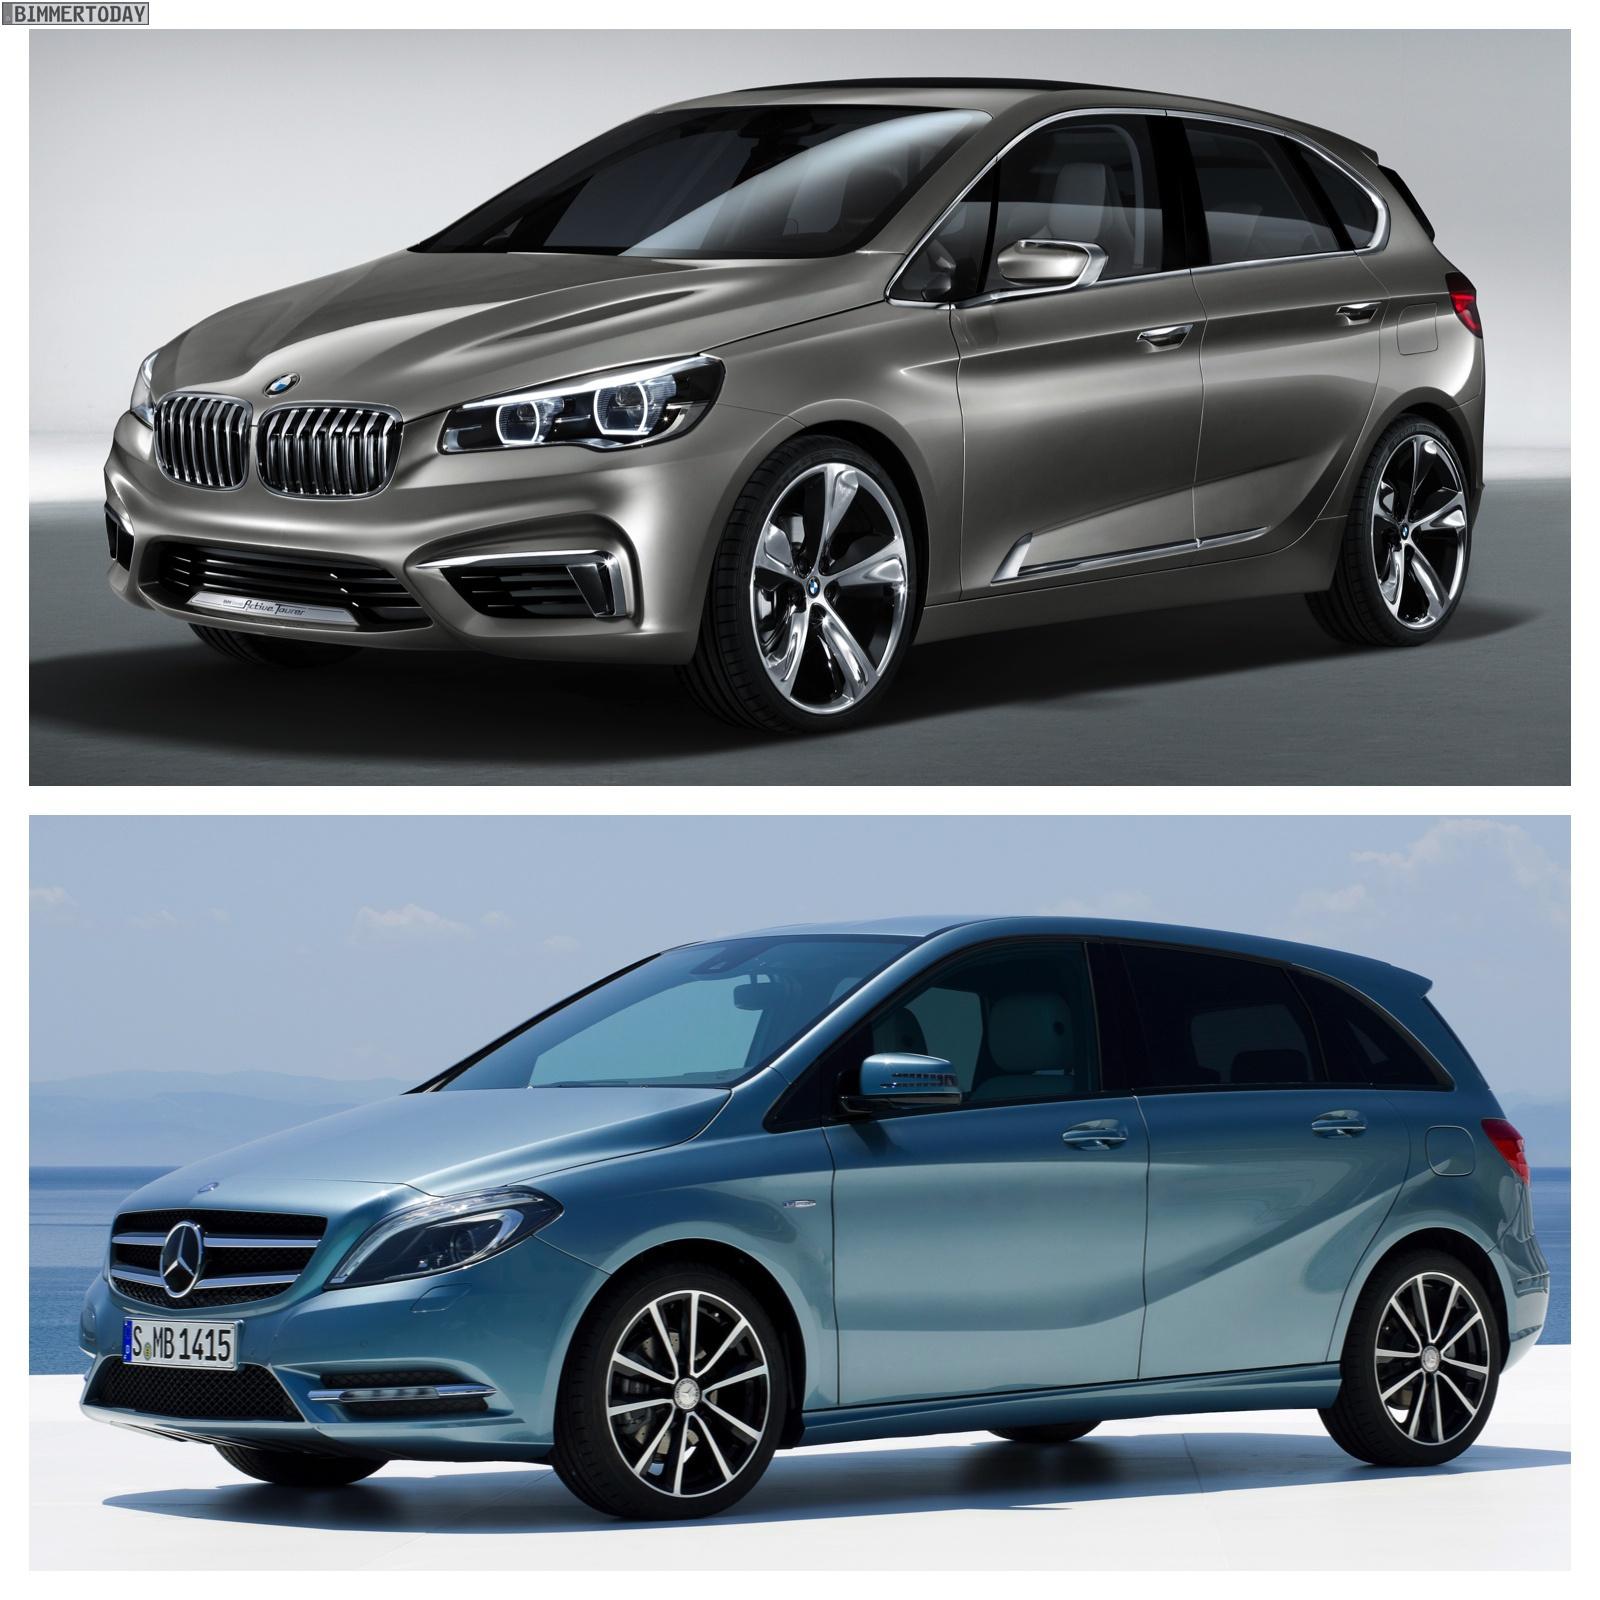 Bildervergleich-BMW-Active-Tourer-Concept-Mercedes-Benz-B-Klasse-01